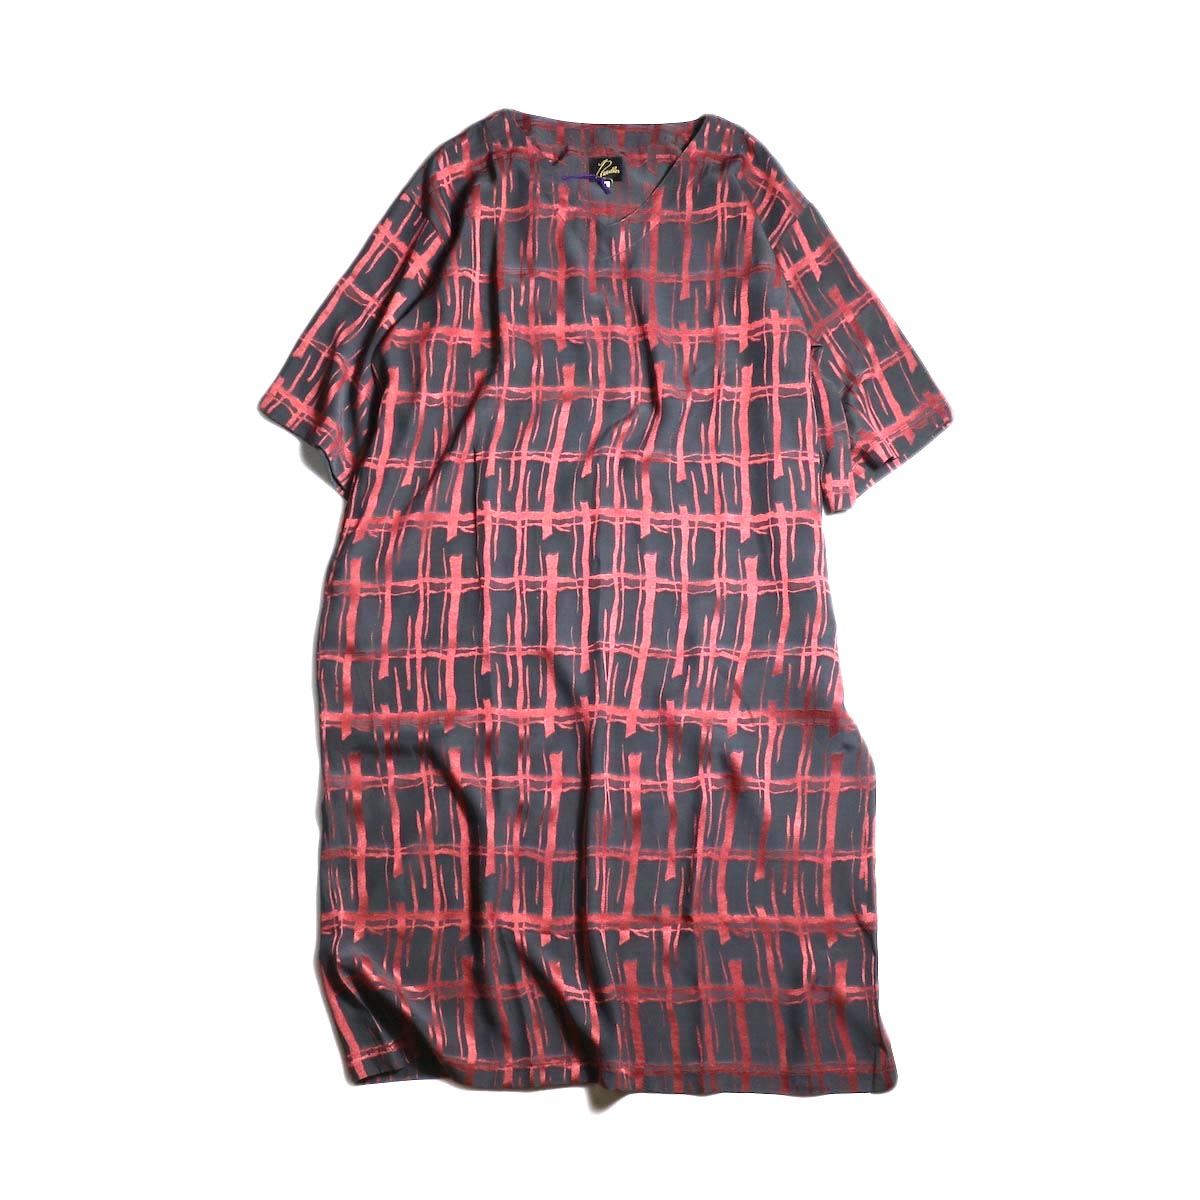 Needles / V Neck Dress-Cu/Ac Jacquard / Plaid (Charcoal)